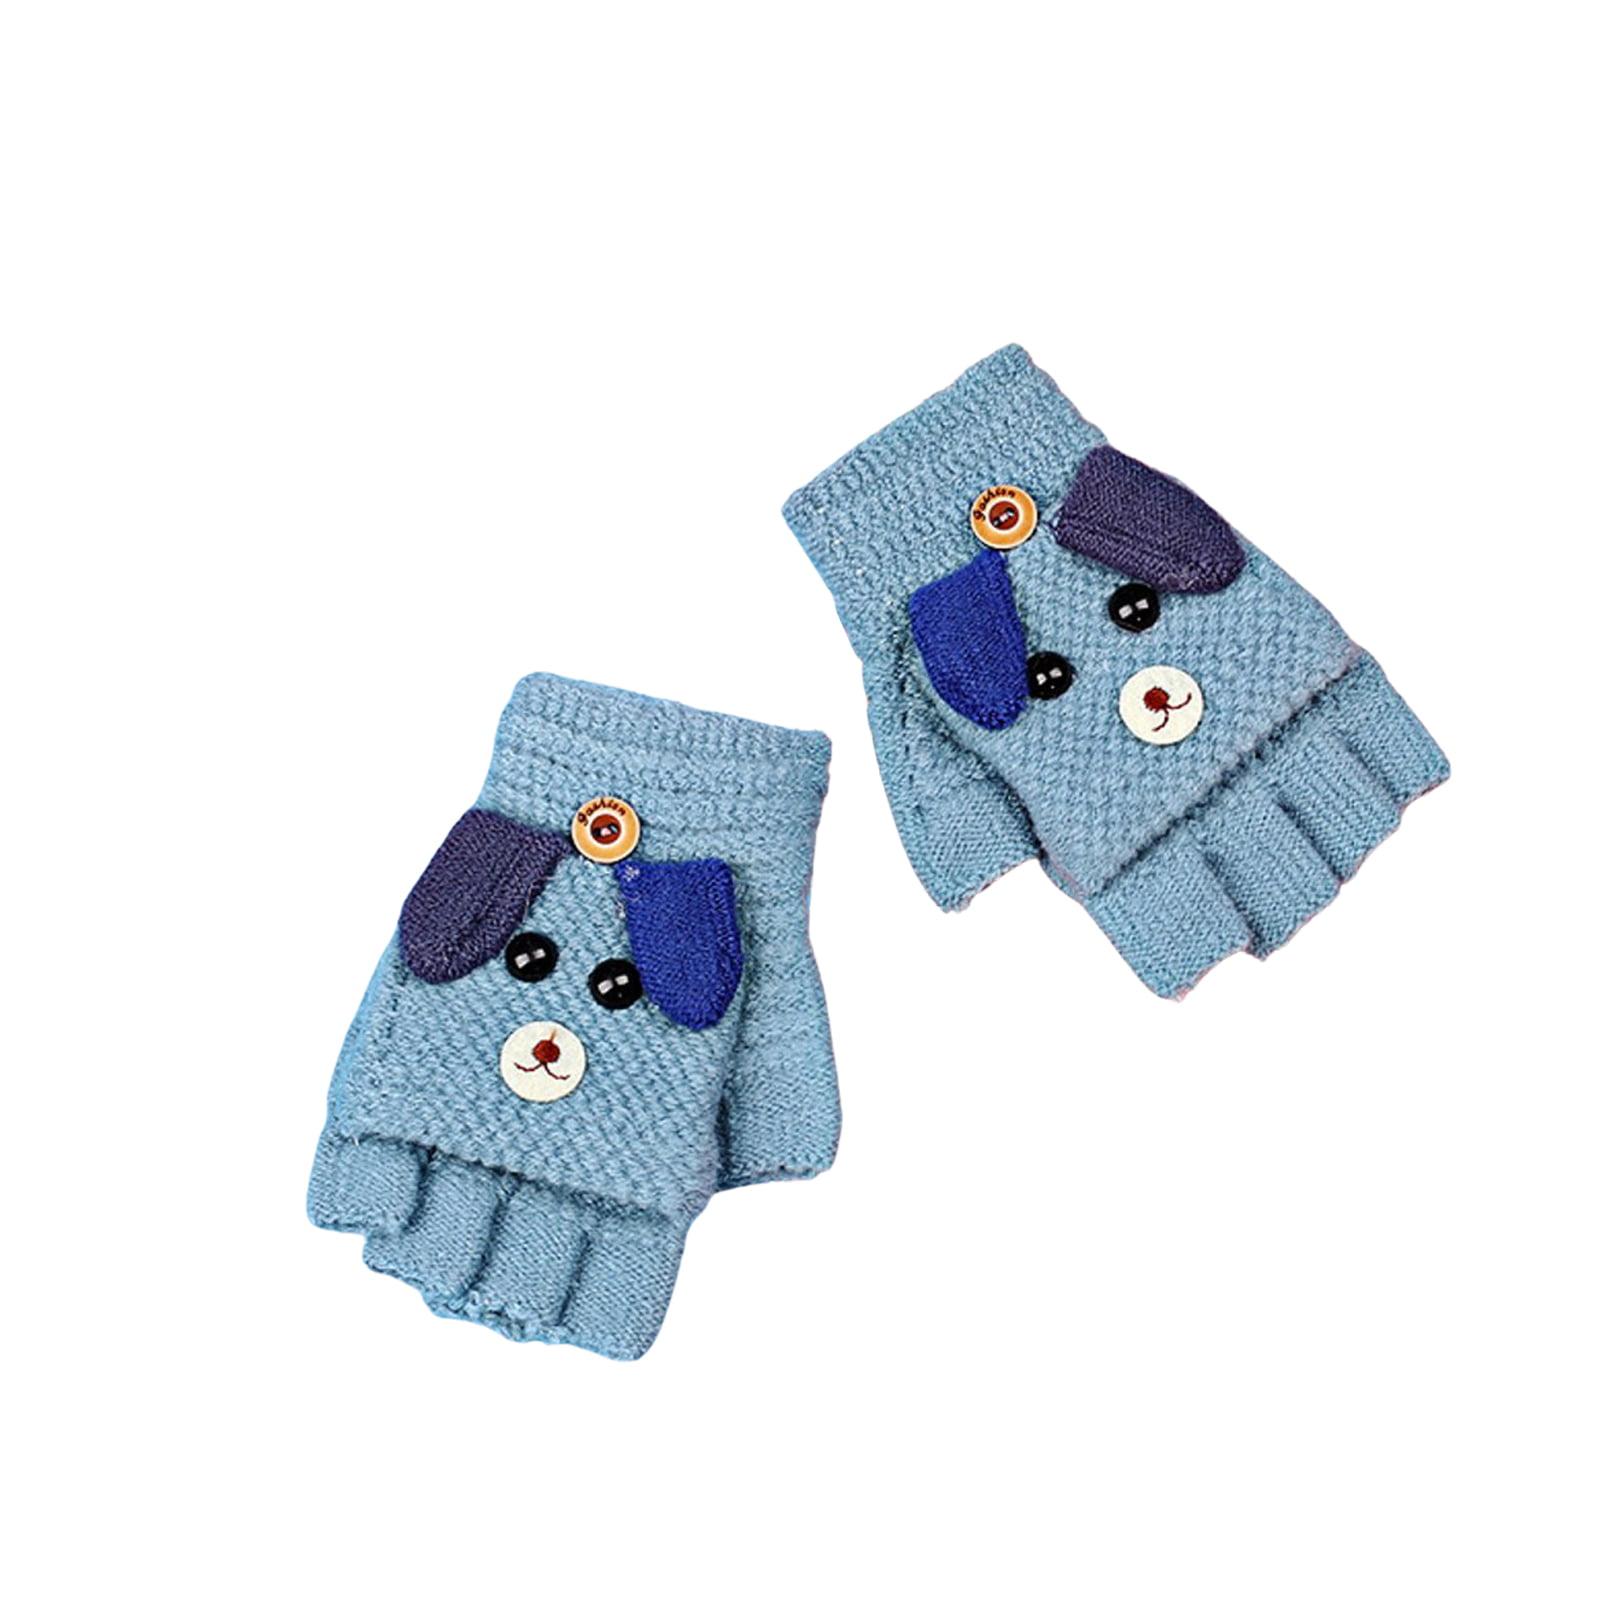 Kids Mittens Gloves Half Fingers Soft Warm with button Flip Top 3-6 yrs old kids